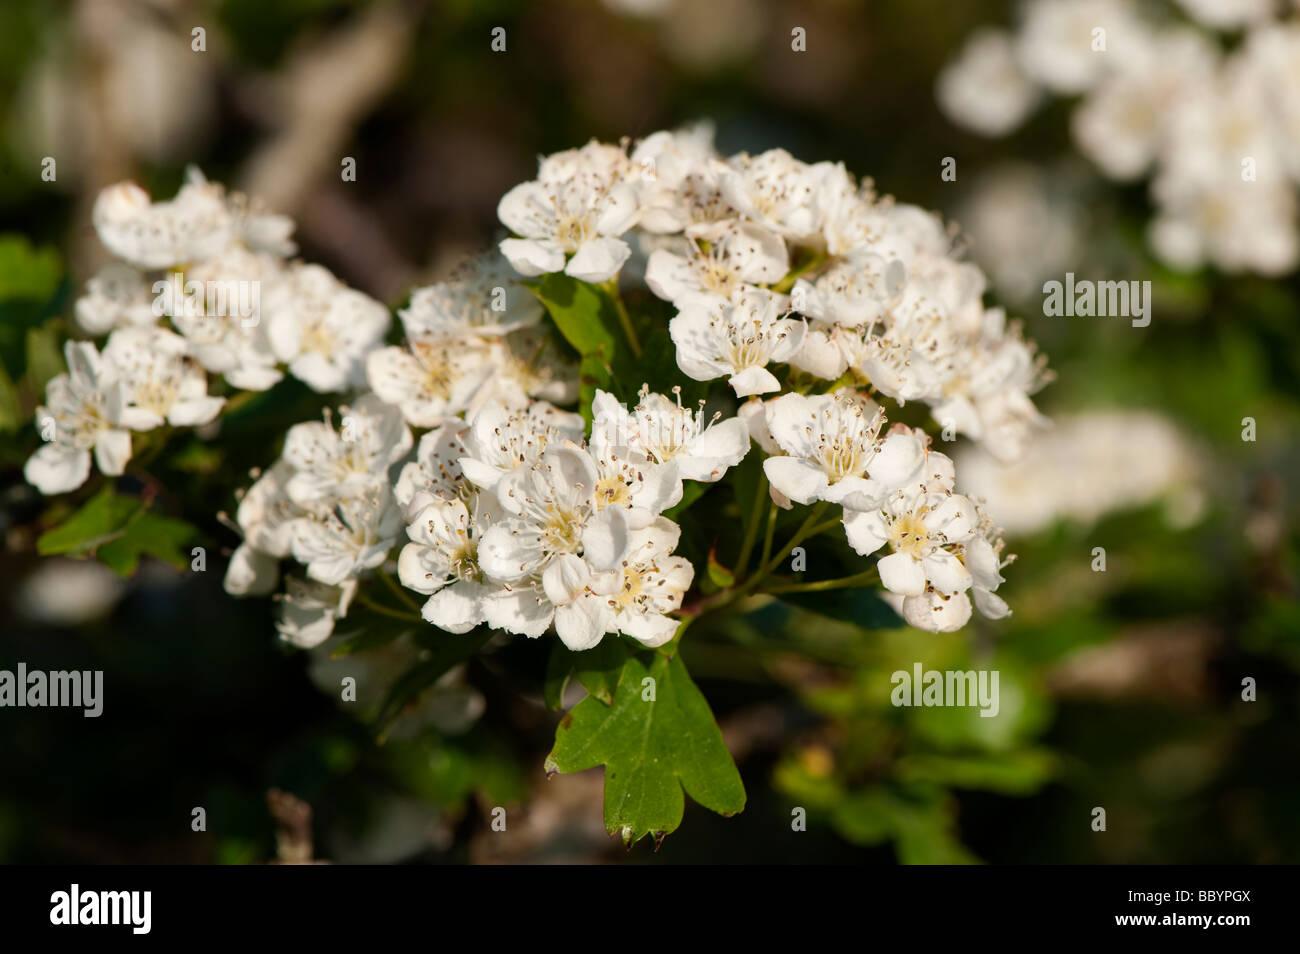 Common Hawthorn Crataegus monogyna blossom in spring England - Stock Image